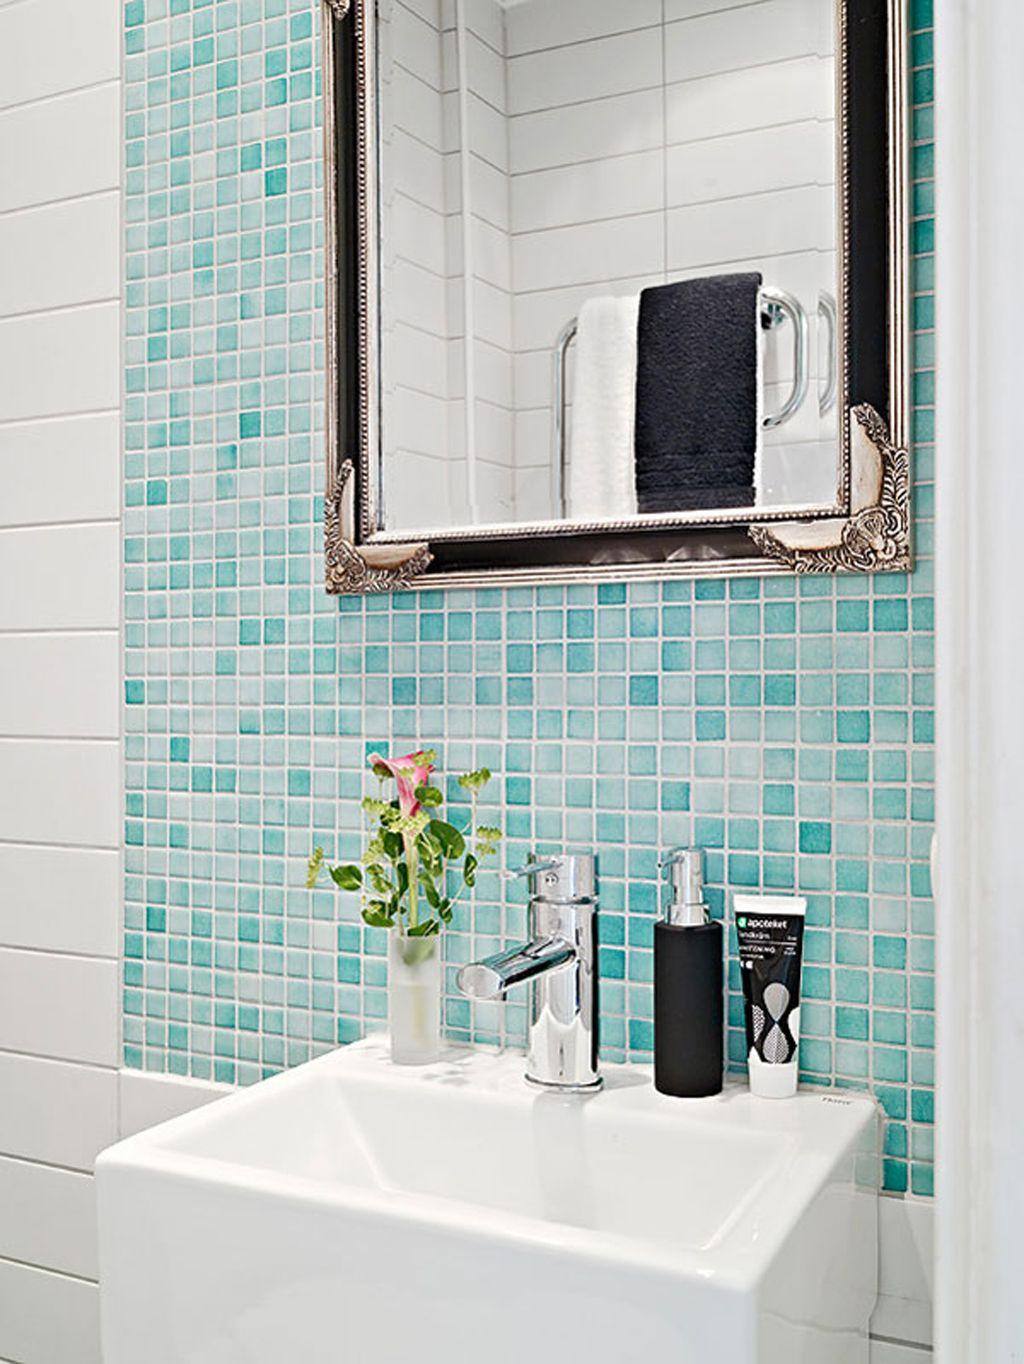 space saving bathroom designs layouts | Blue tiles, Bathroom design ...